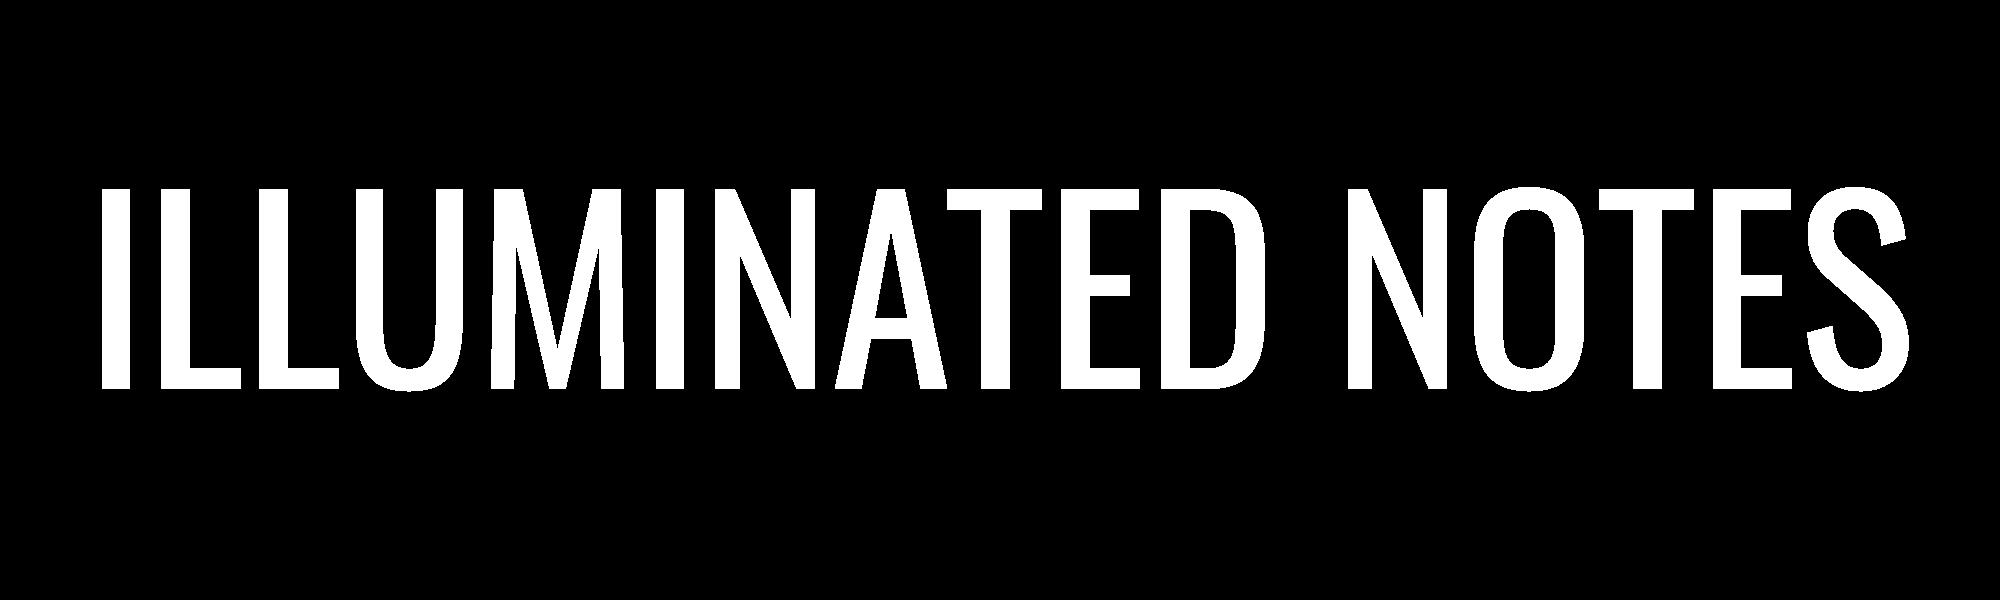 illuminated-notes-late-nite-art-index-banner